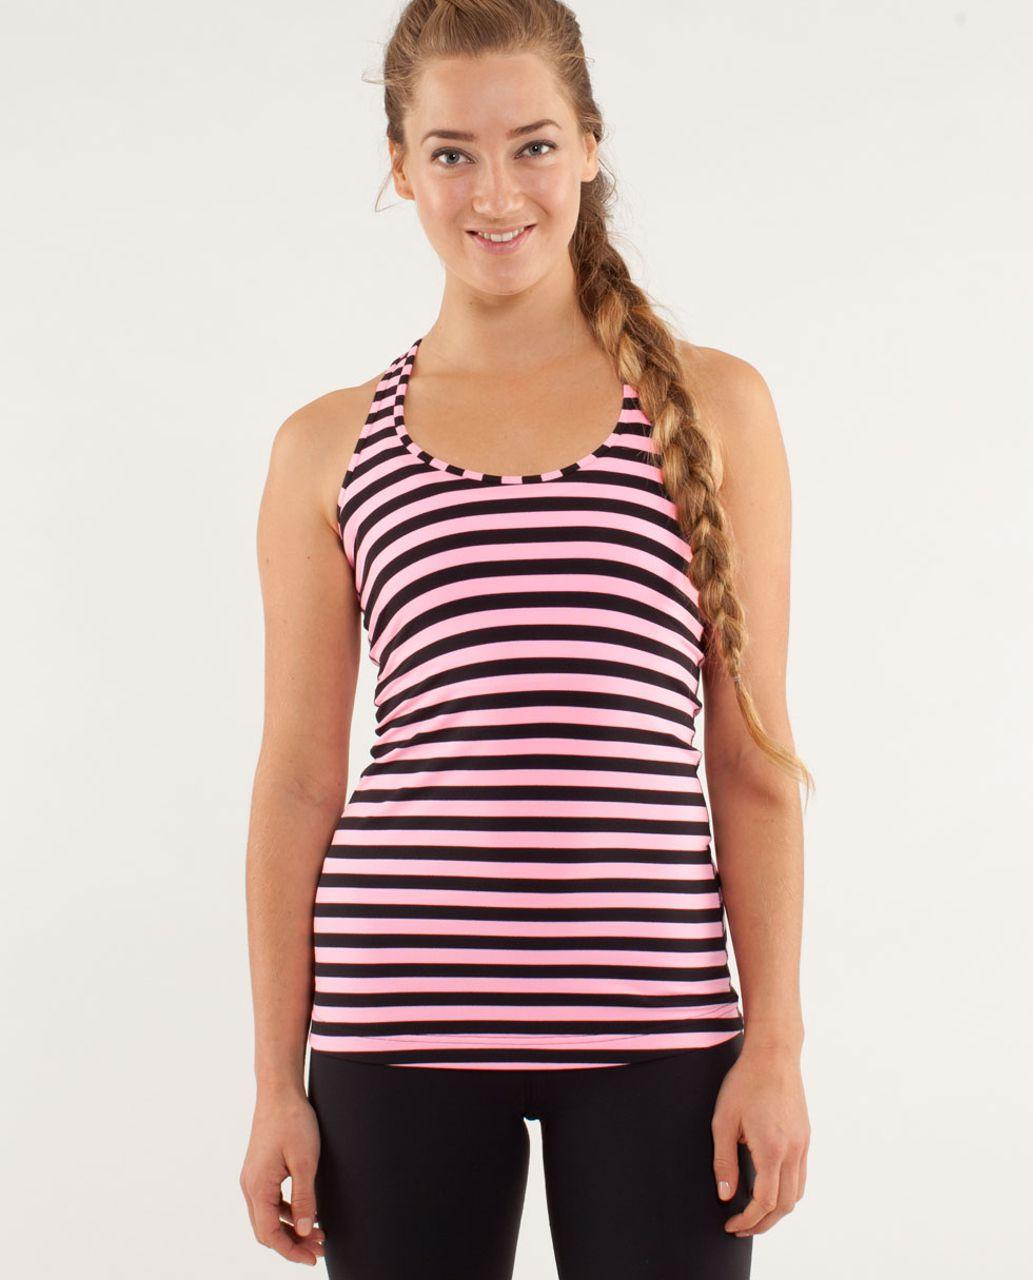 Lululemon Cool Racerback - Sea Stripe Pink Shell